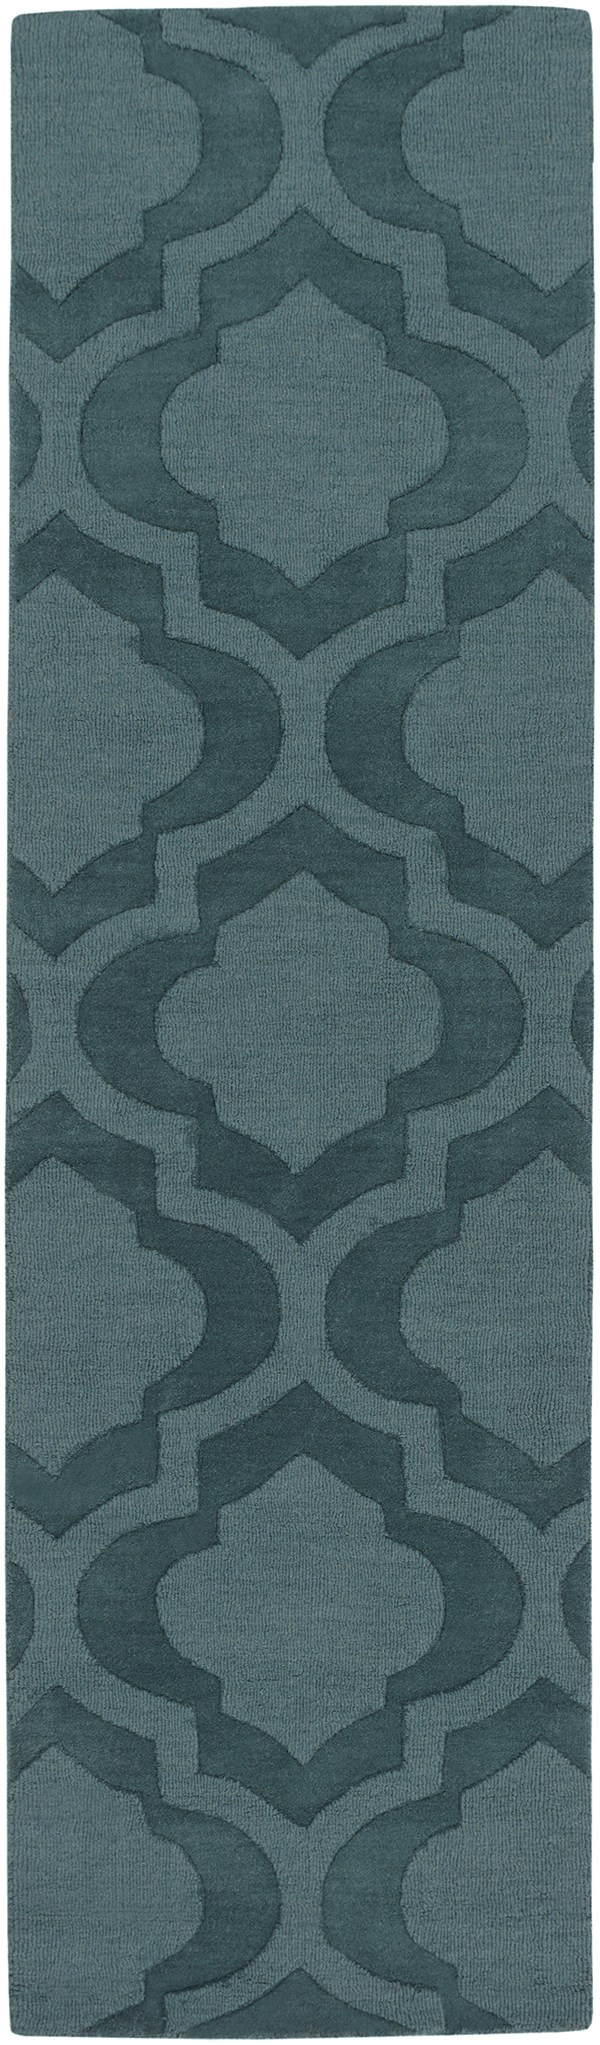 Teal (AWHP-4010) Moroccan Area Rug